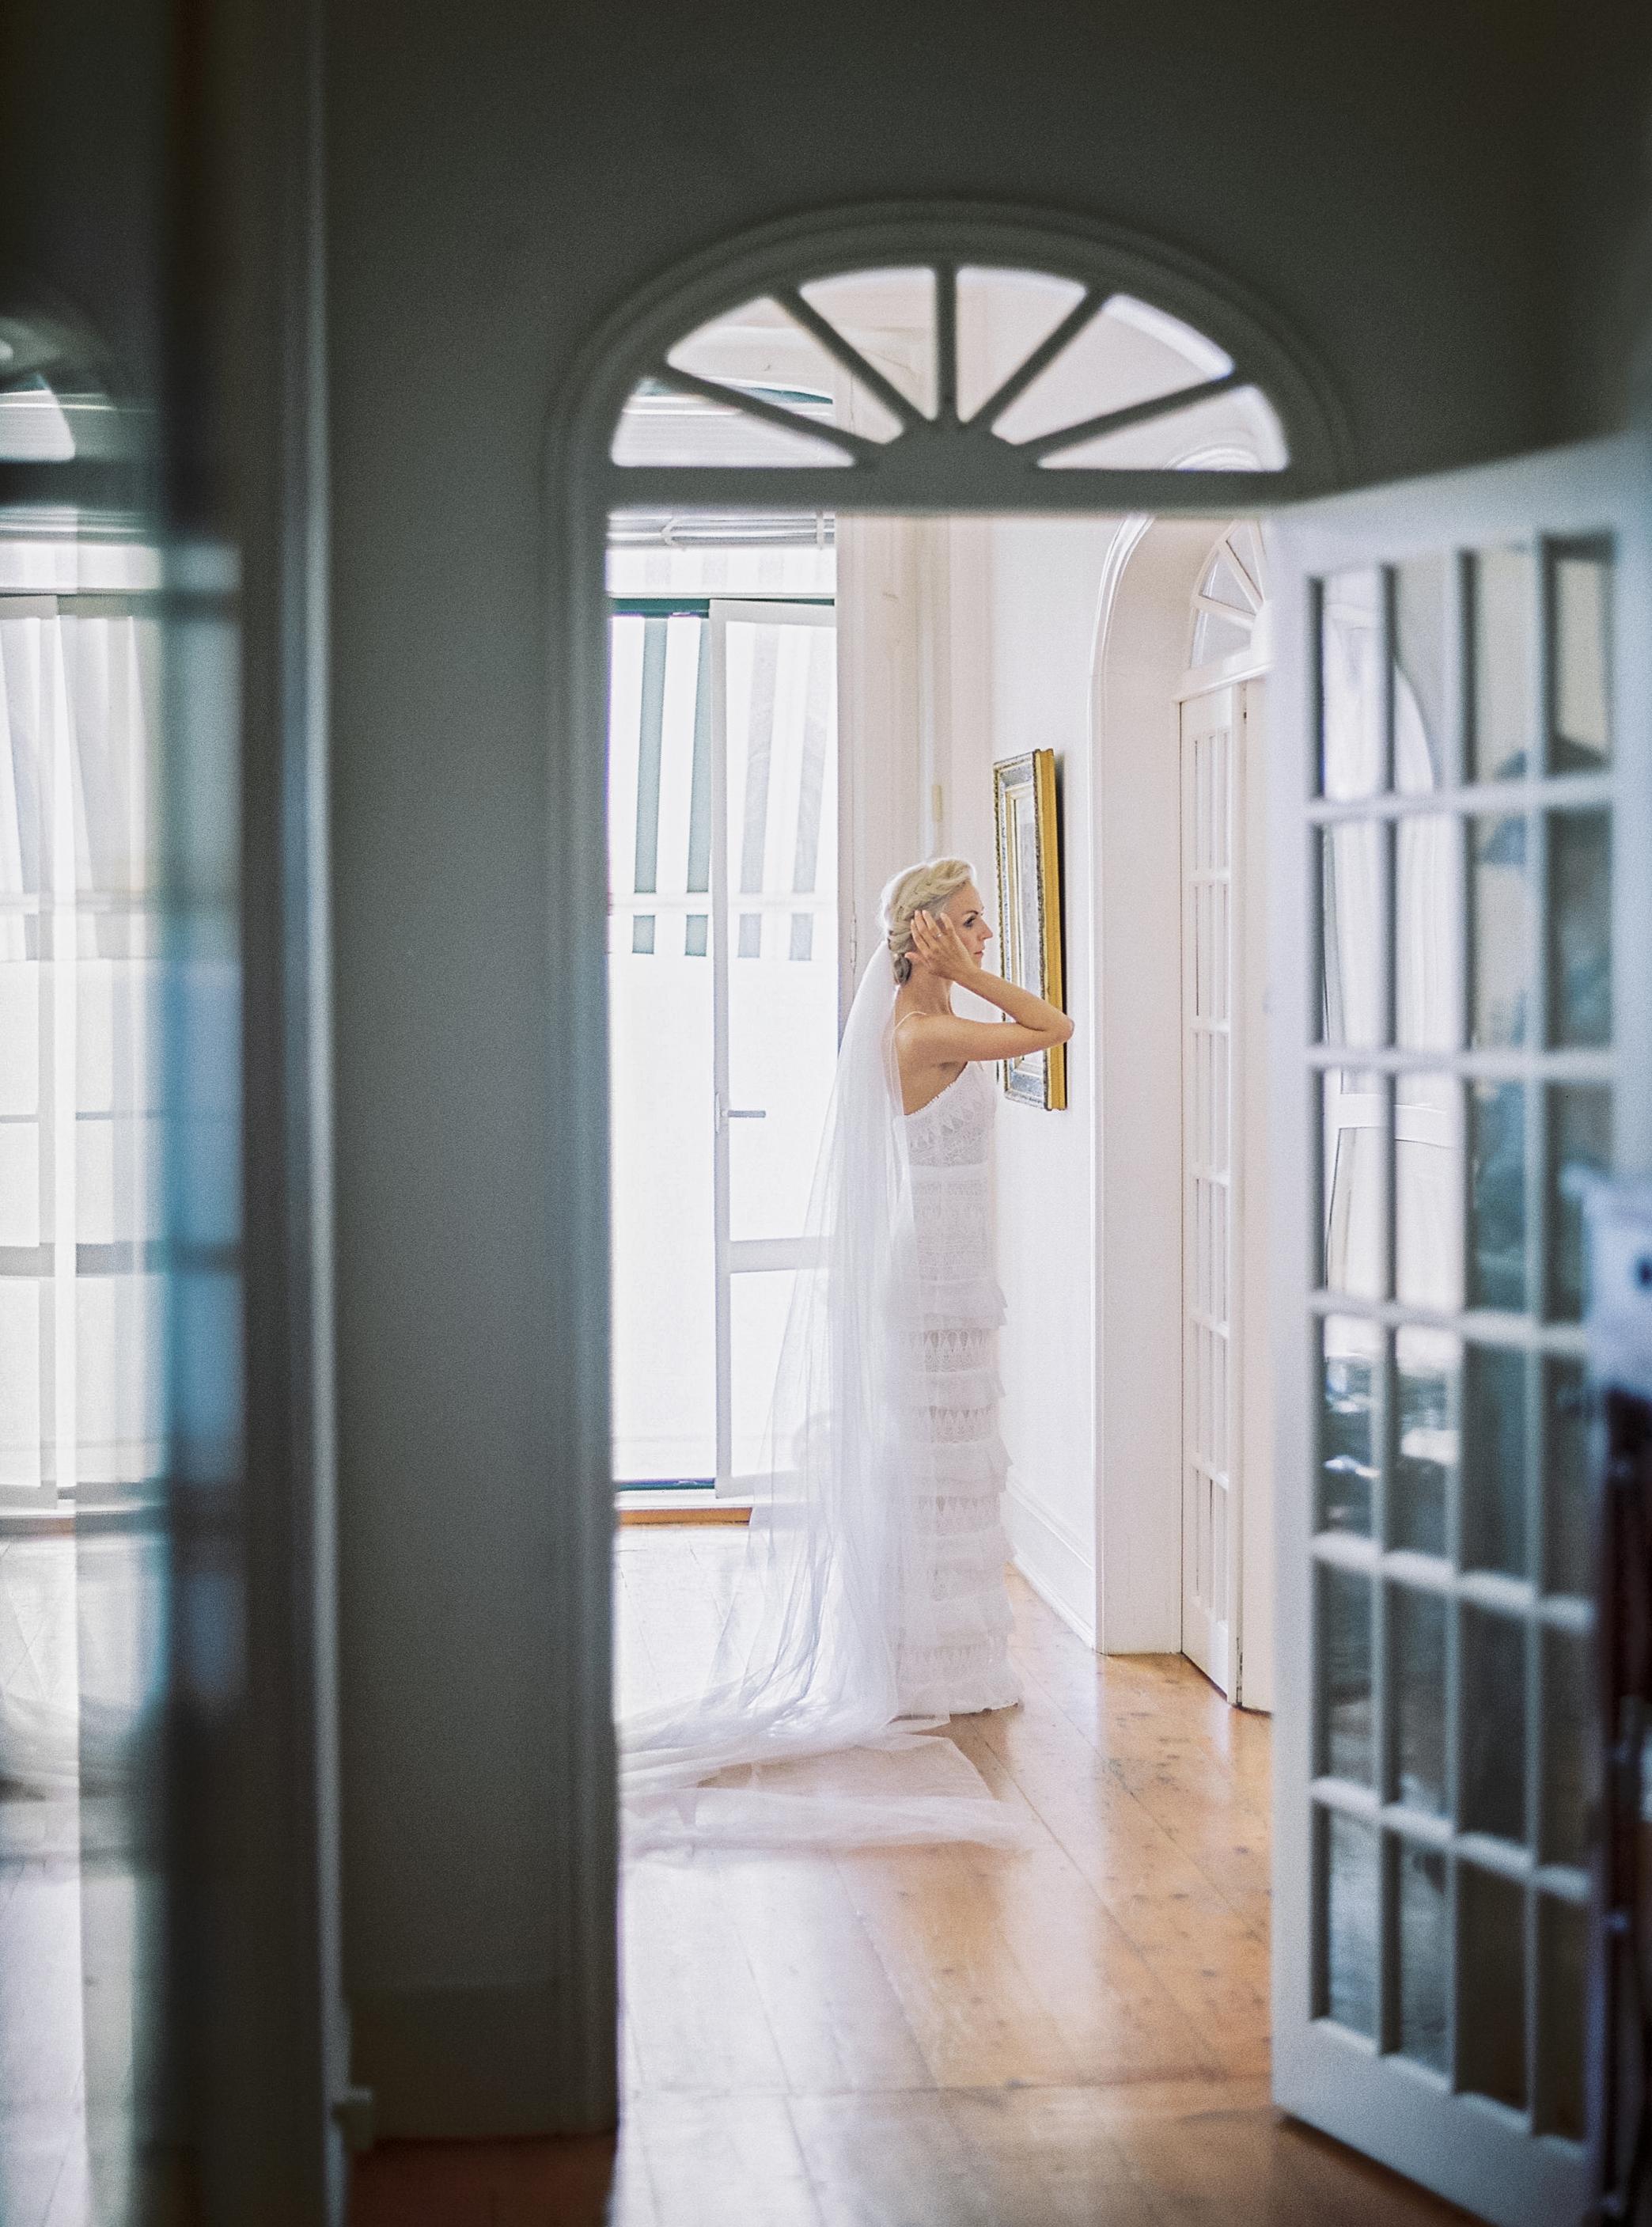 Nastia_Vesna_Photography_Wedding_Portugal_7.jpg